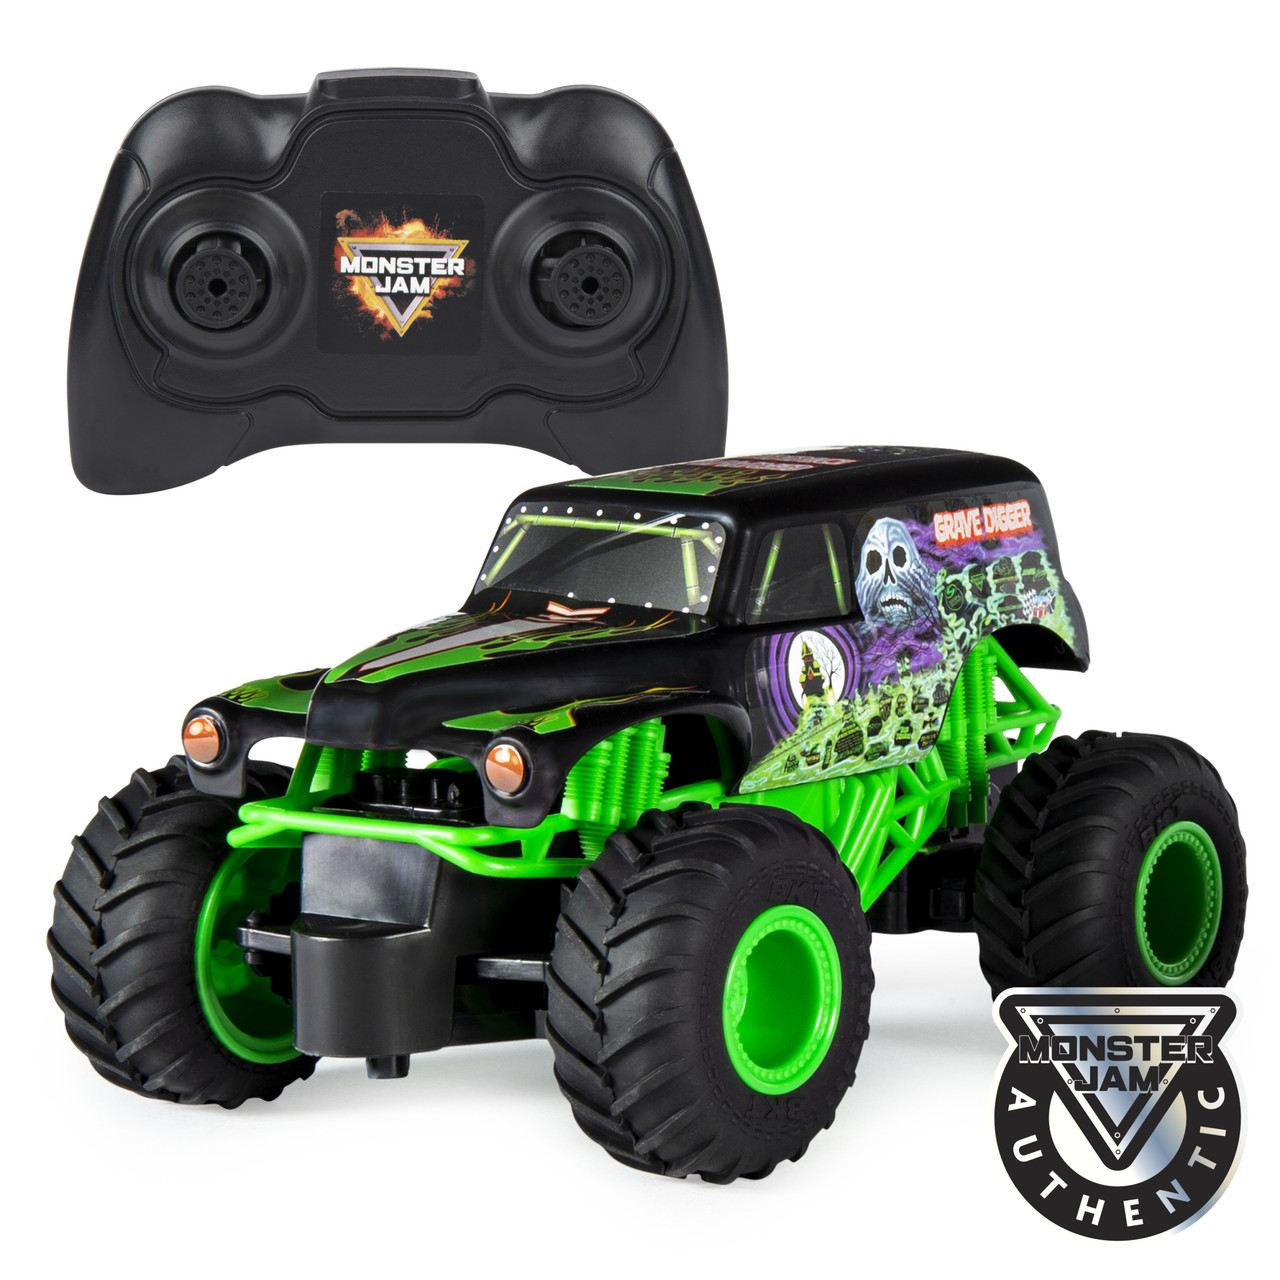 Hot Wheels Monster Jam Внедорожник джип на р/у 1:24 Scale Grave Digger Remote Control Trucks